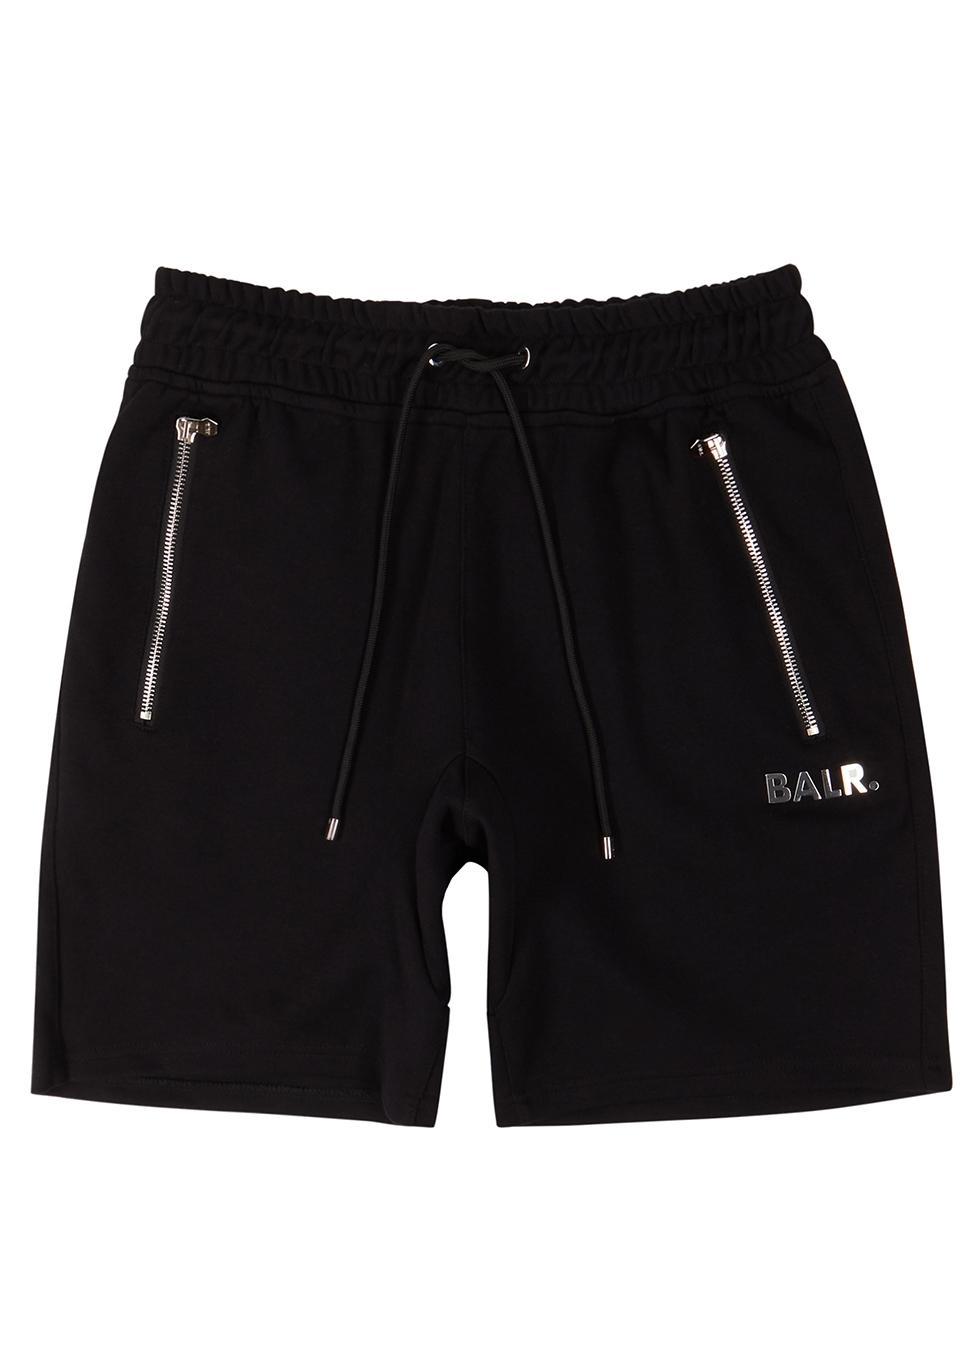 Q-Series black cotton-blend shorts